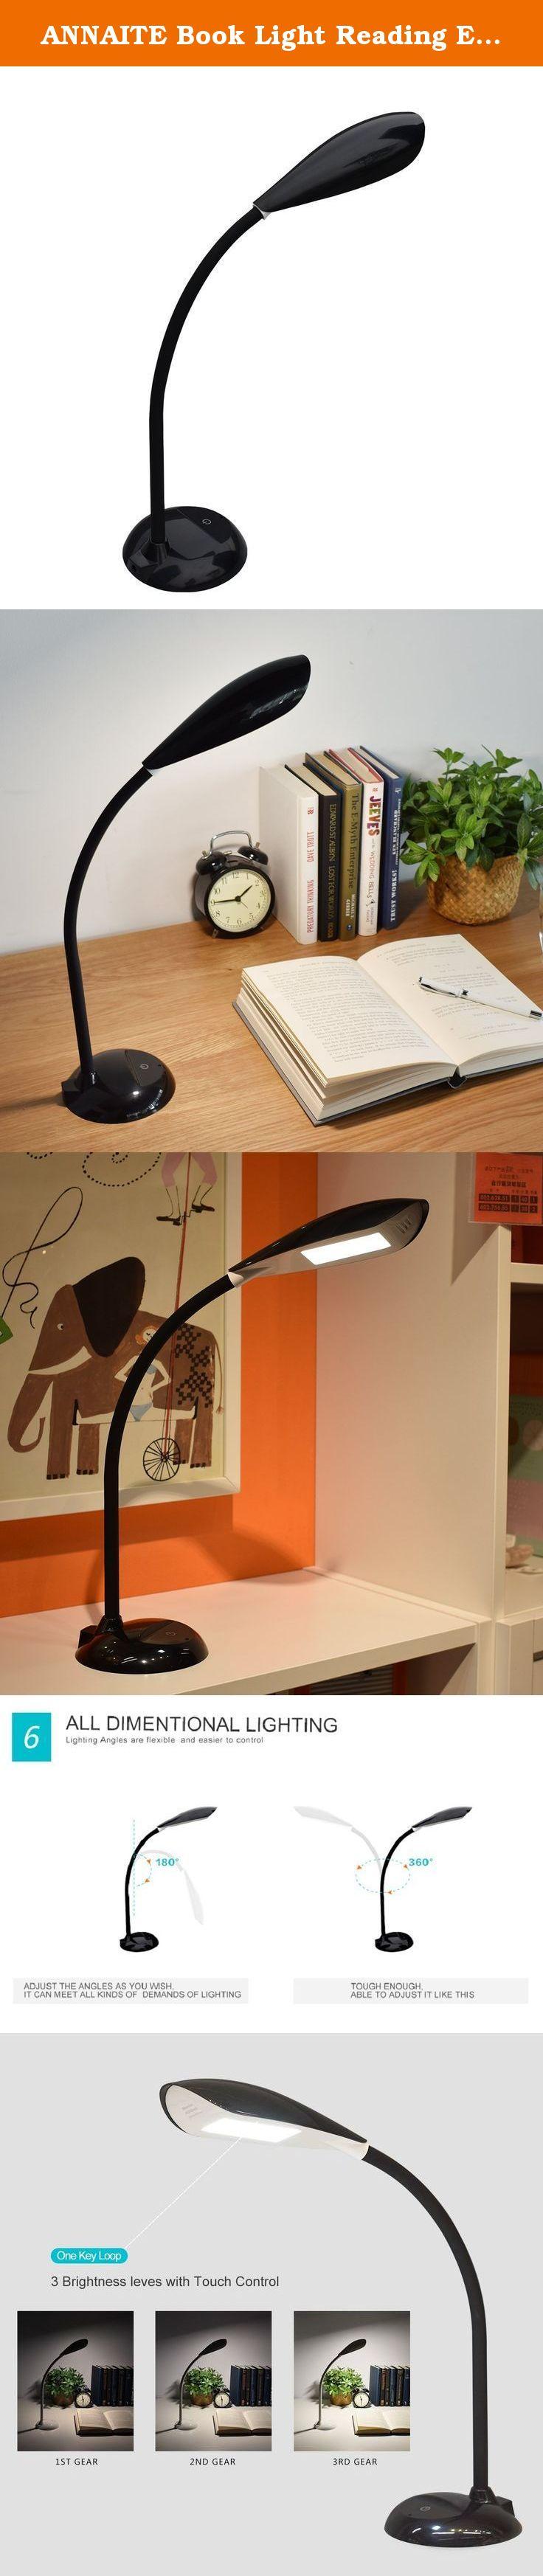 annaite book light reading eye caring led desk lamp touch control